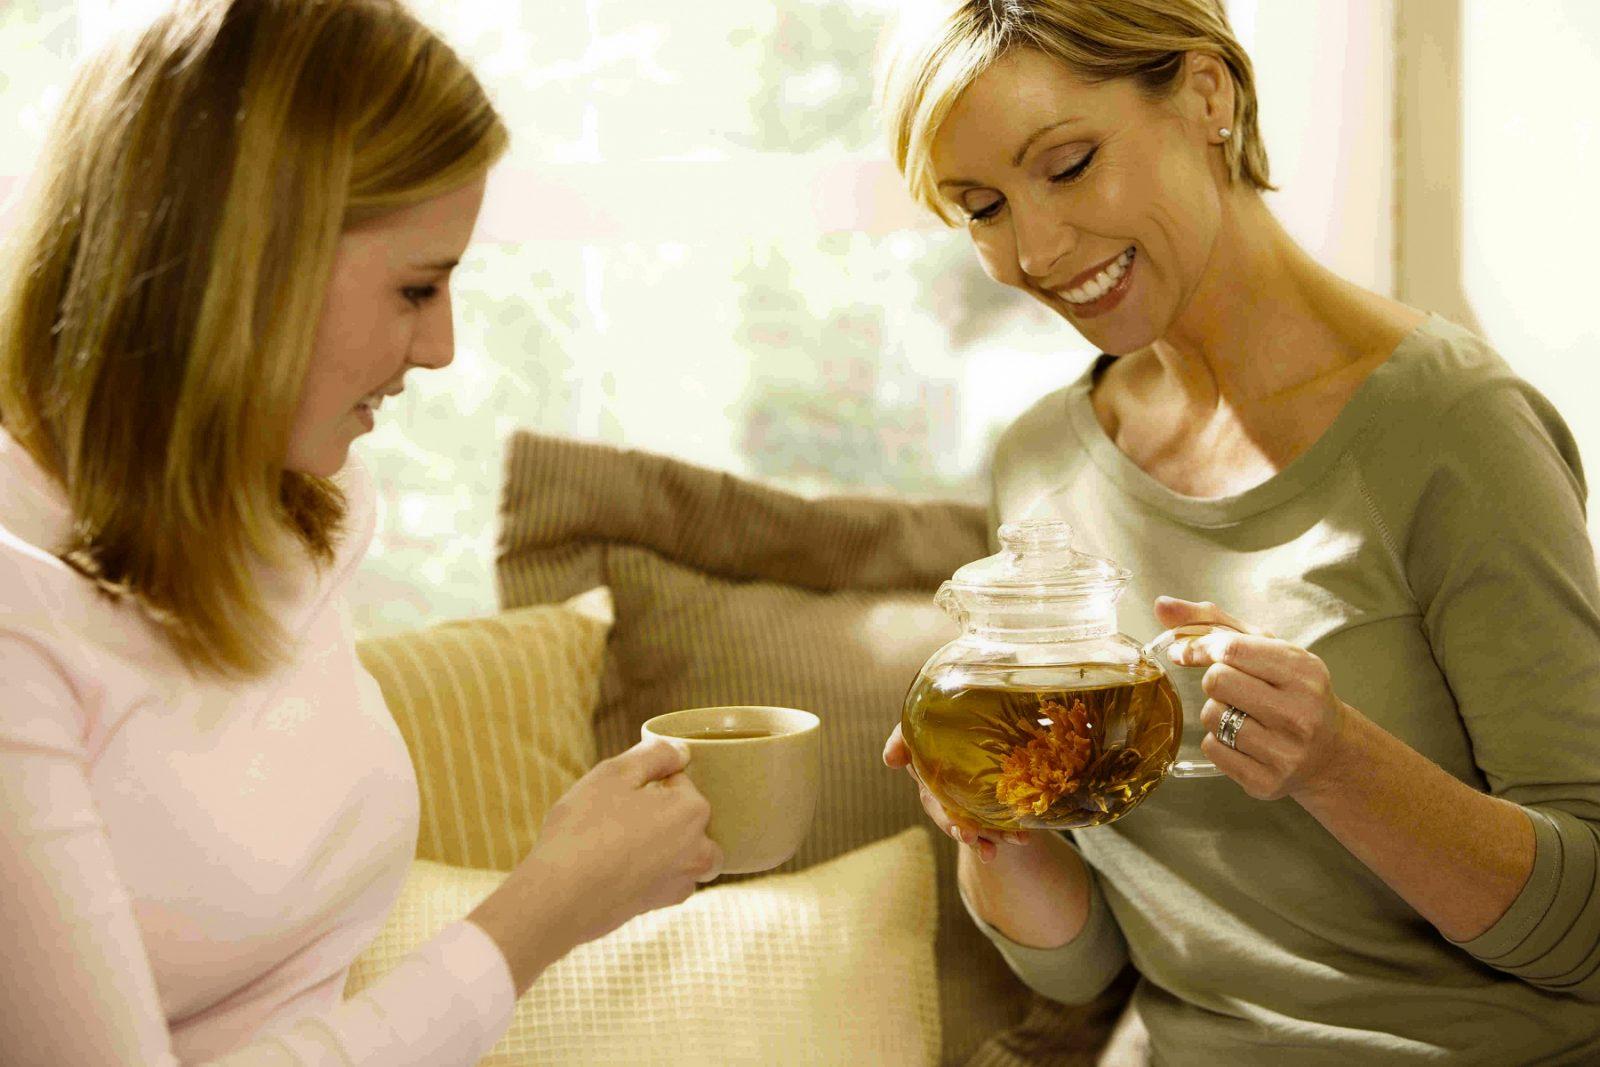 https://www.kleo.ru/img/articles/Good-morning-tea-with-friends.jpg